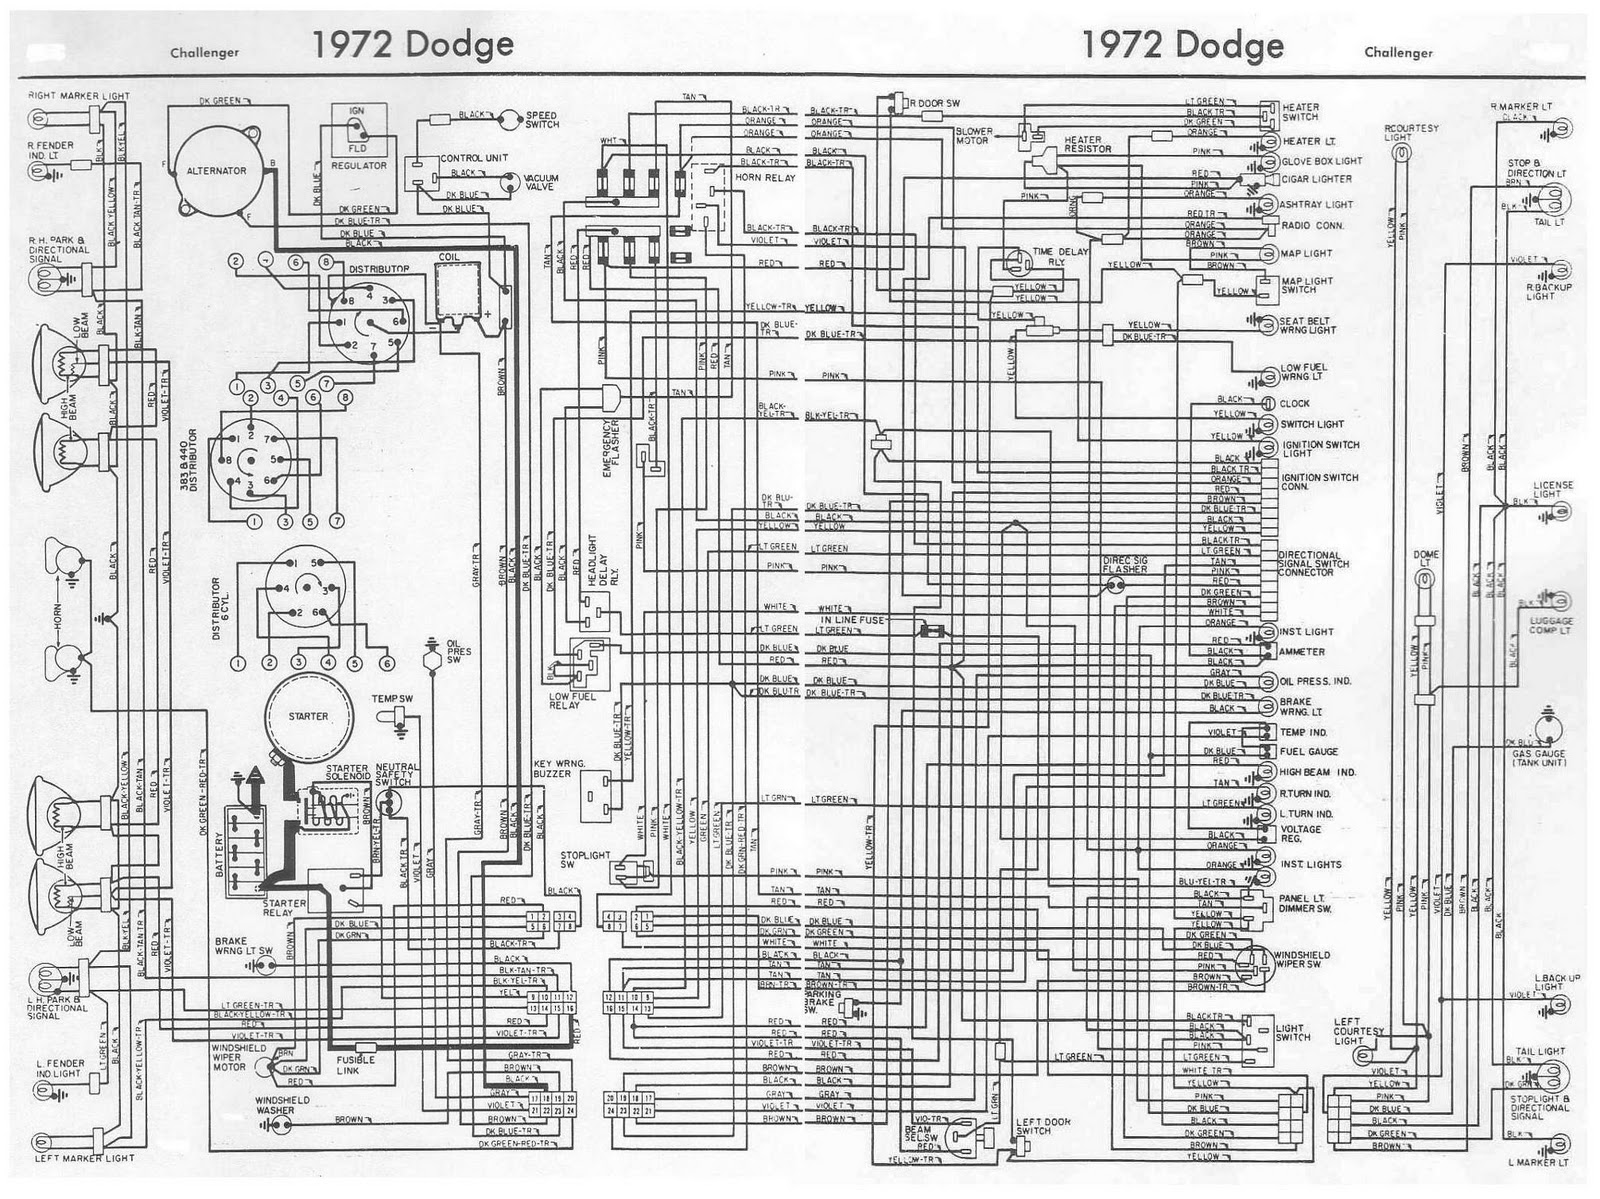 2012 Dodge Durango Alternator Wiring Diagram Expert Schematics Grand Caravan Trailer Firing Order Www Topsimages Com Engine